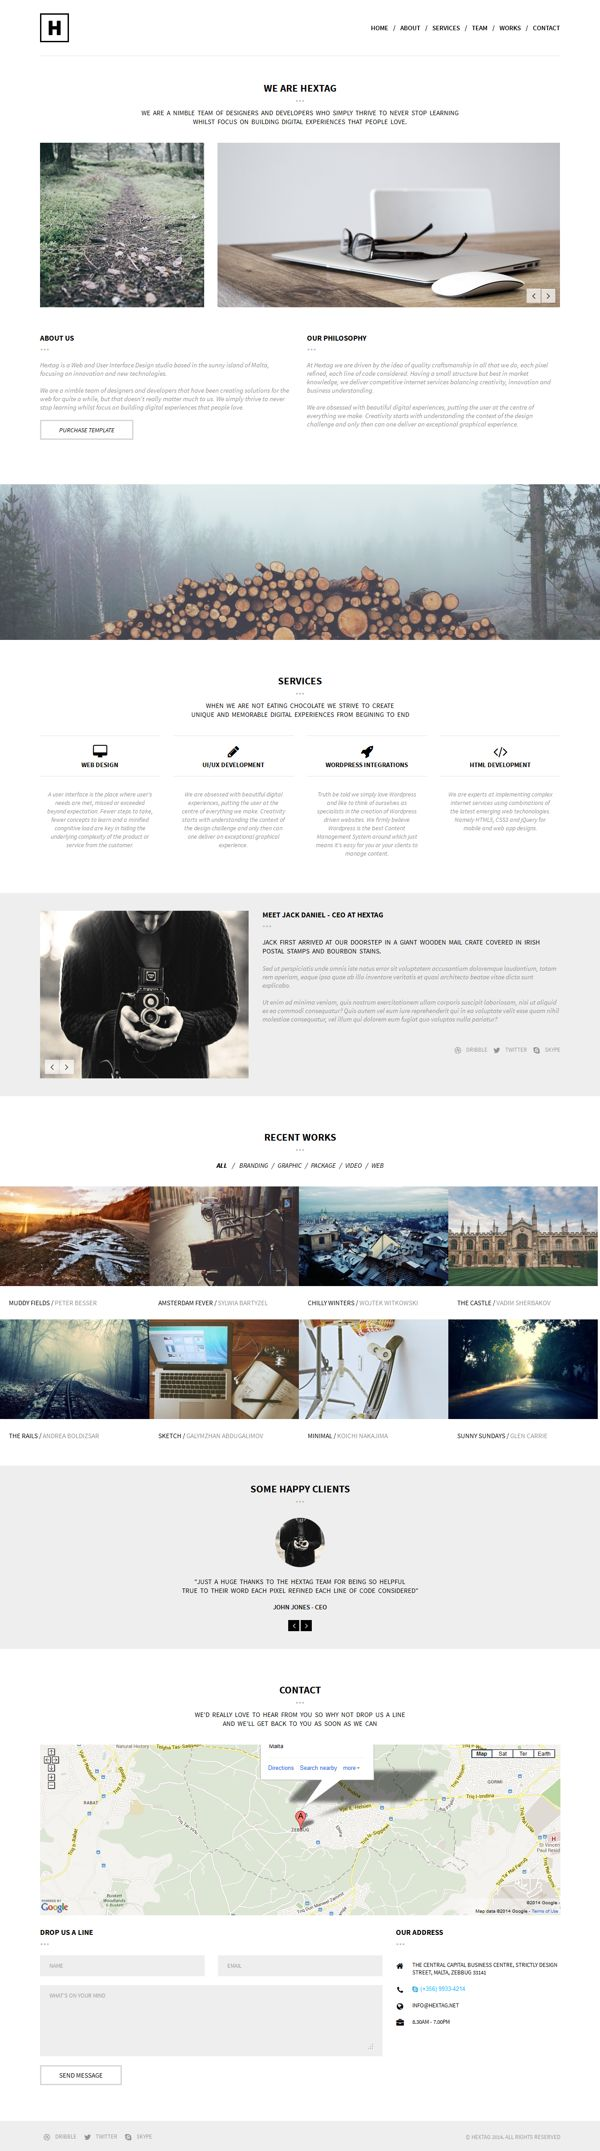 H - Minimal Theme (Apple Style) by WordPress Design Awards, via Behance